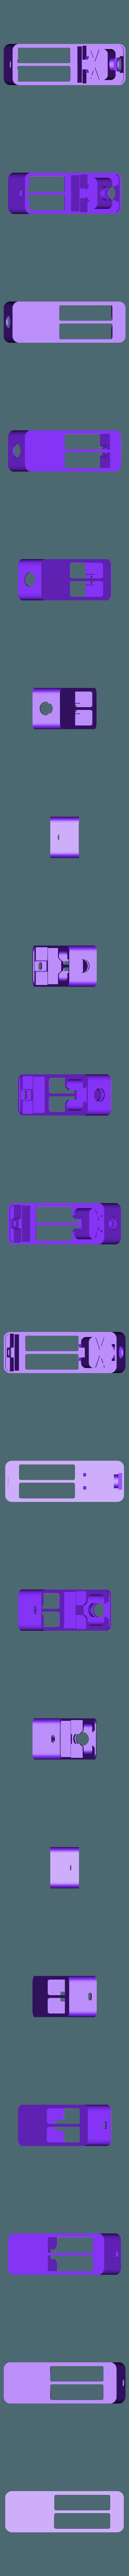 VA_Meter_Case_v1-1_TOP.STL Download free STL file Voltmeter/Ammeter Case - 1 • Template to 3D print, WalterHsiao